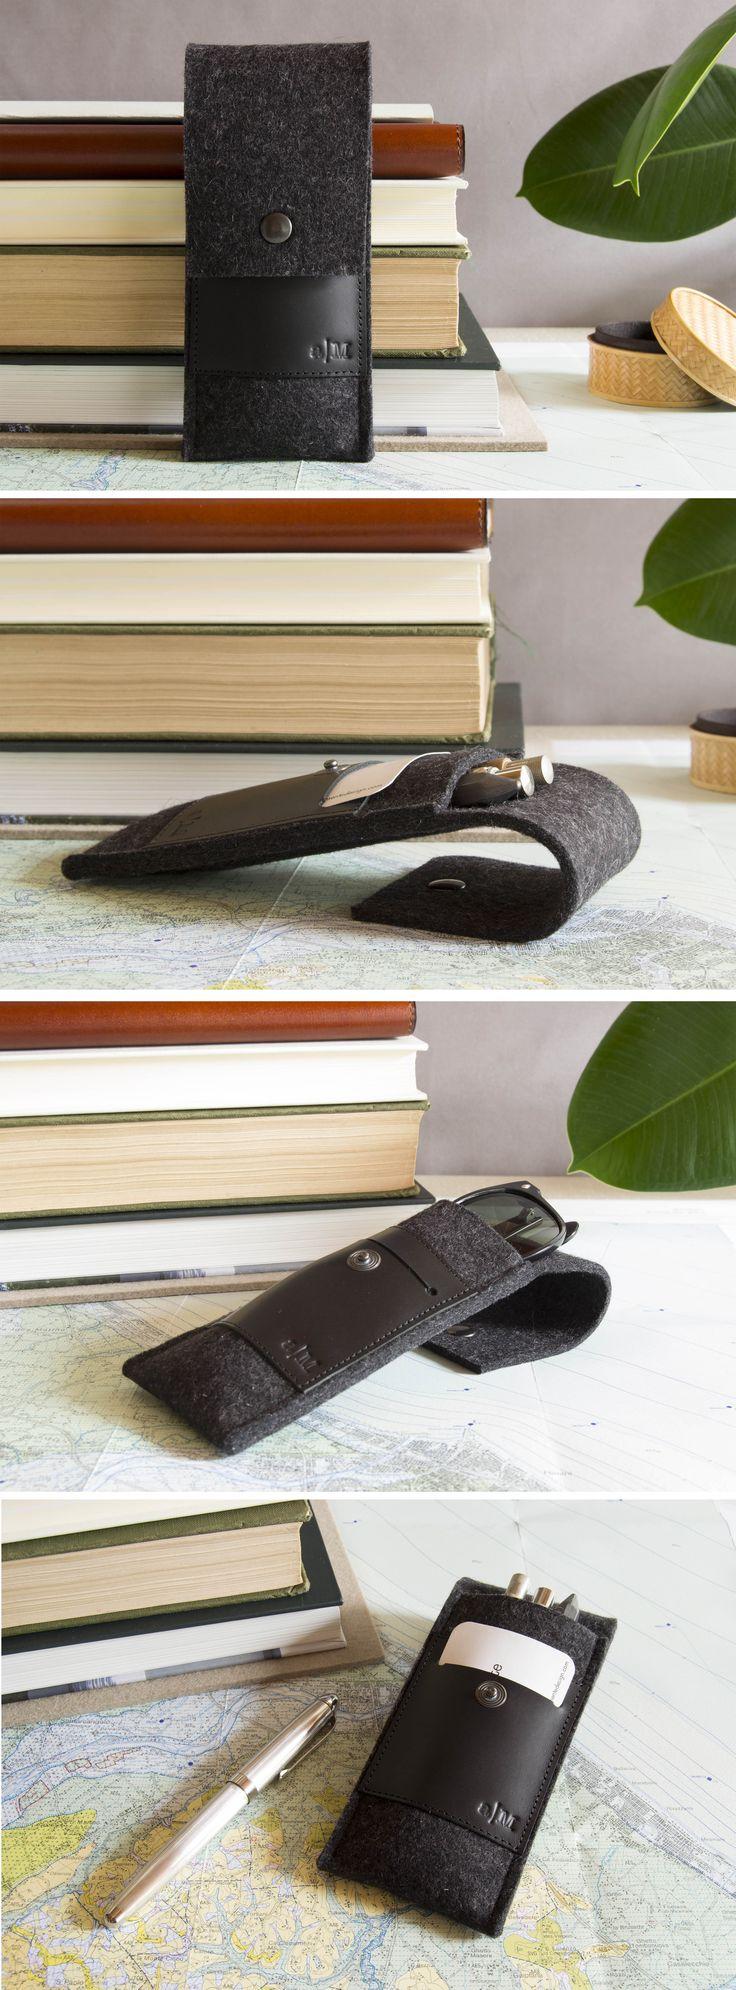 A stylish pencil case made of wool felt and real leather #woolfelt #felt #vegetabletannedleather #madeinitaly #penholder #glassescase #feltcase